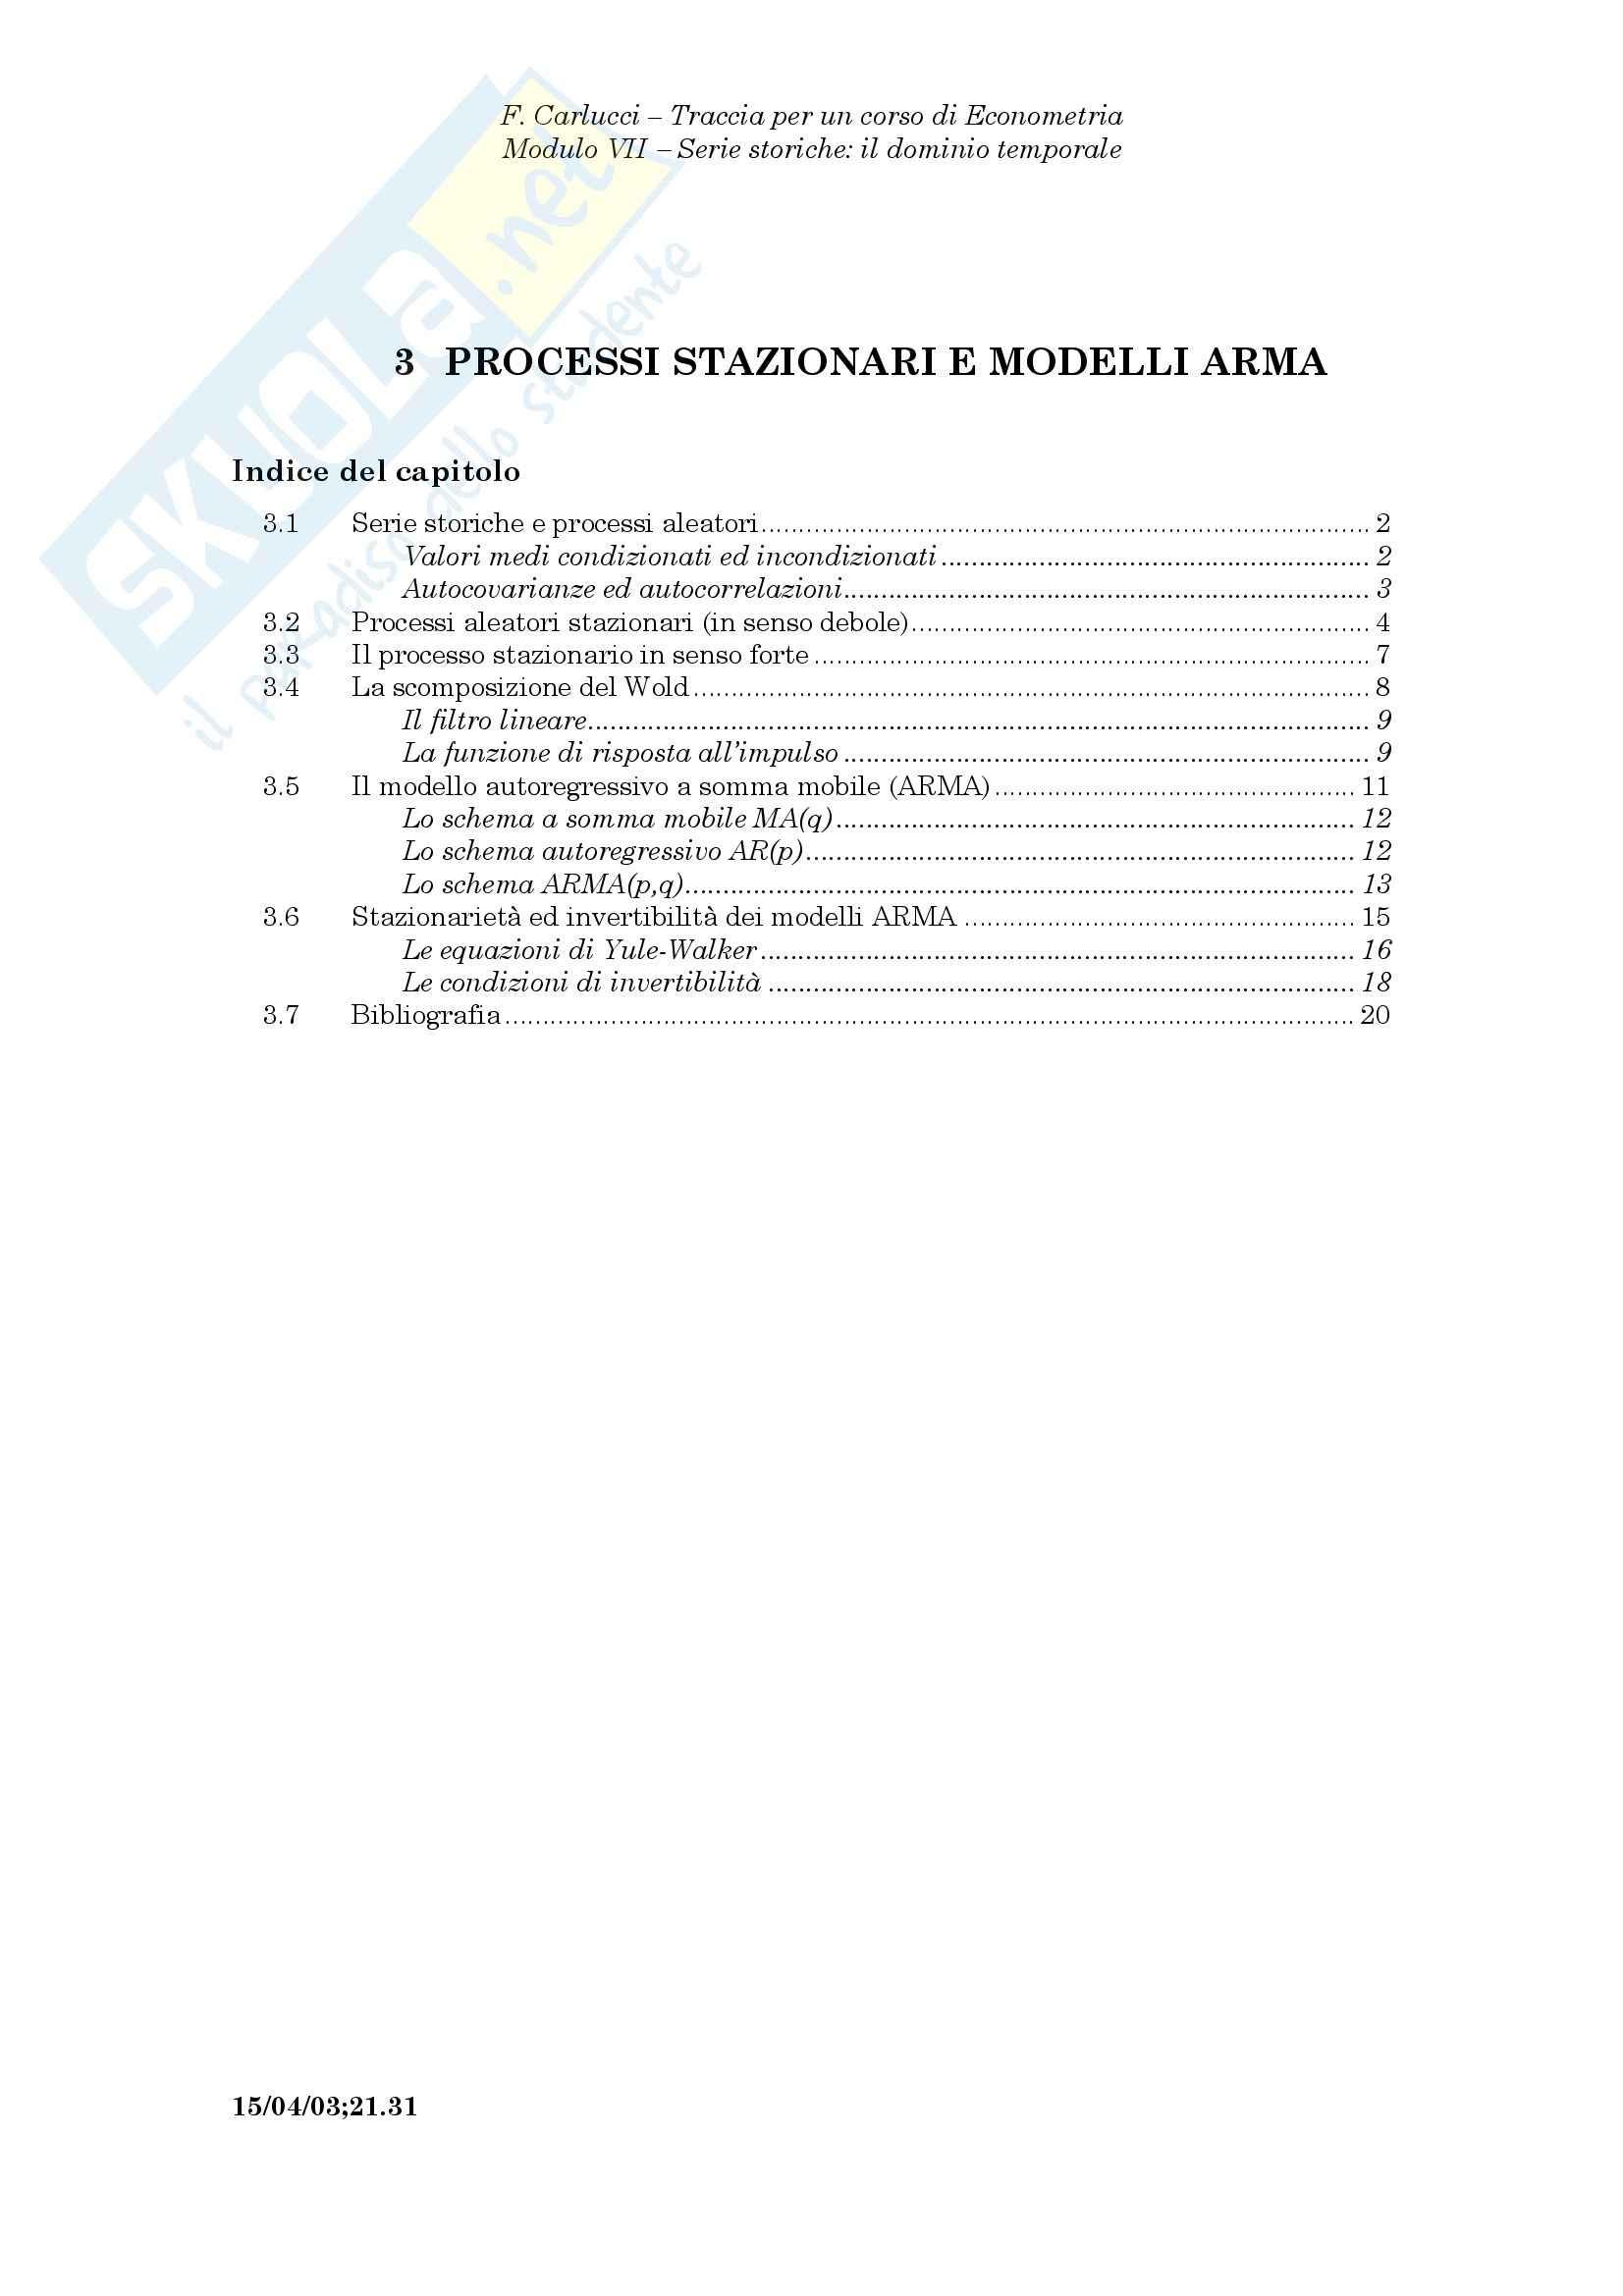 Econometria - i modelli ARMA